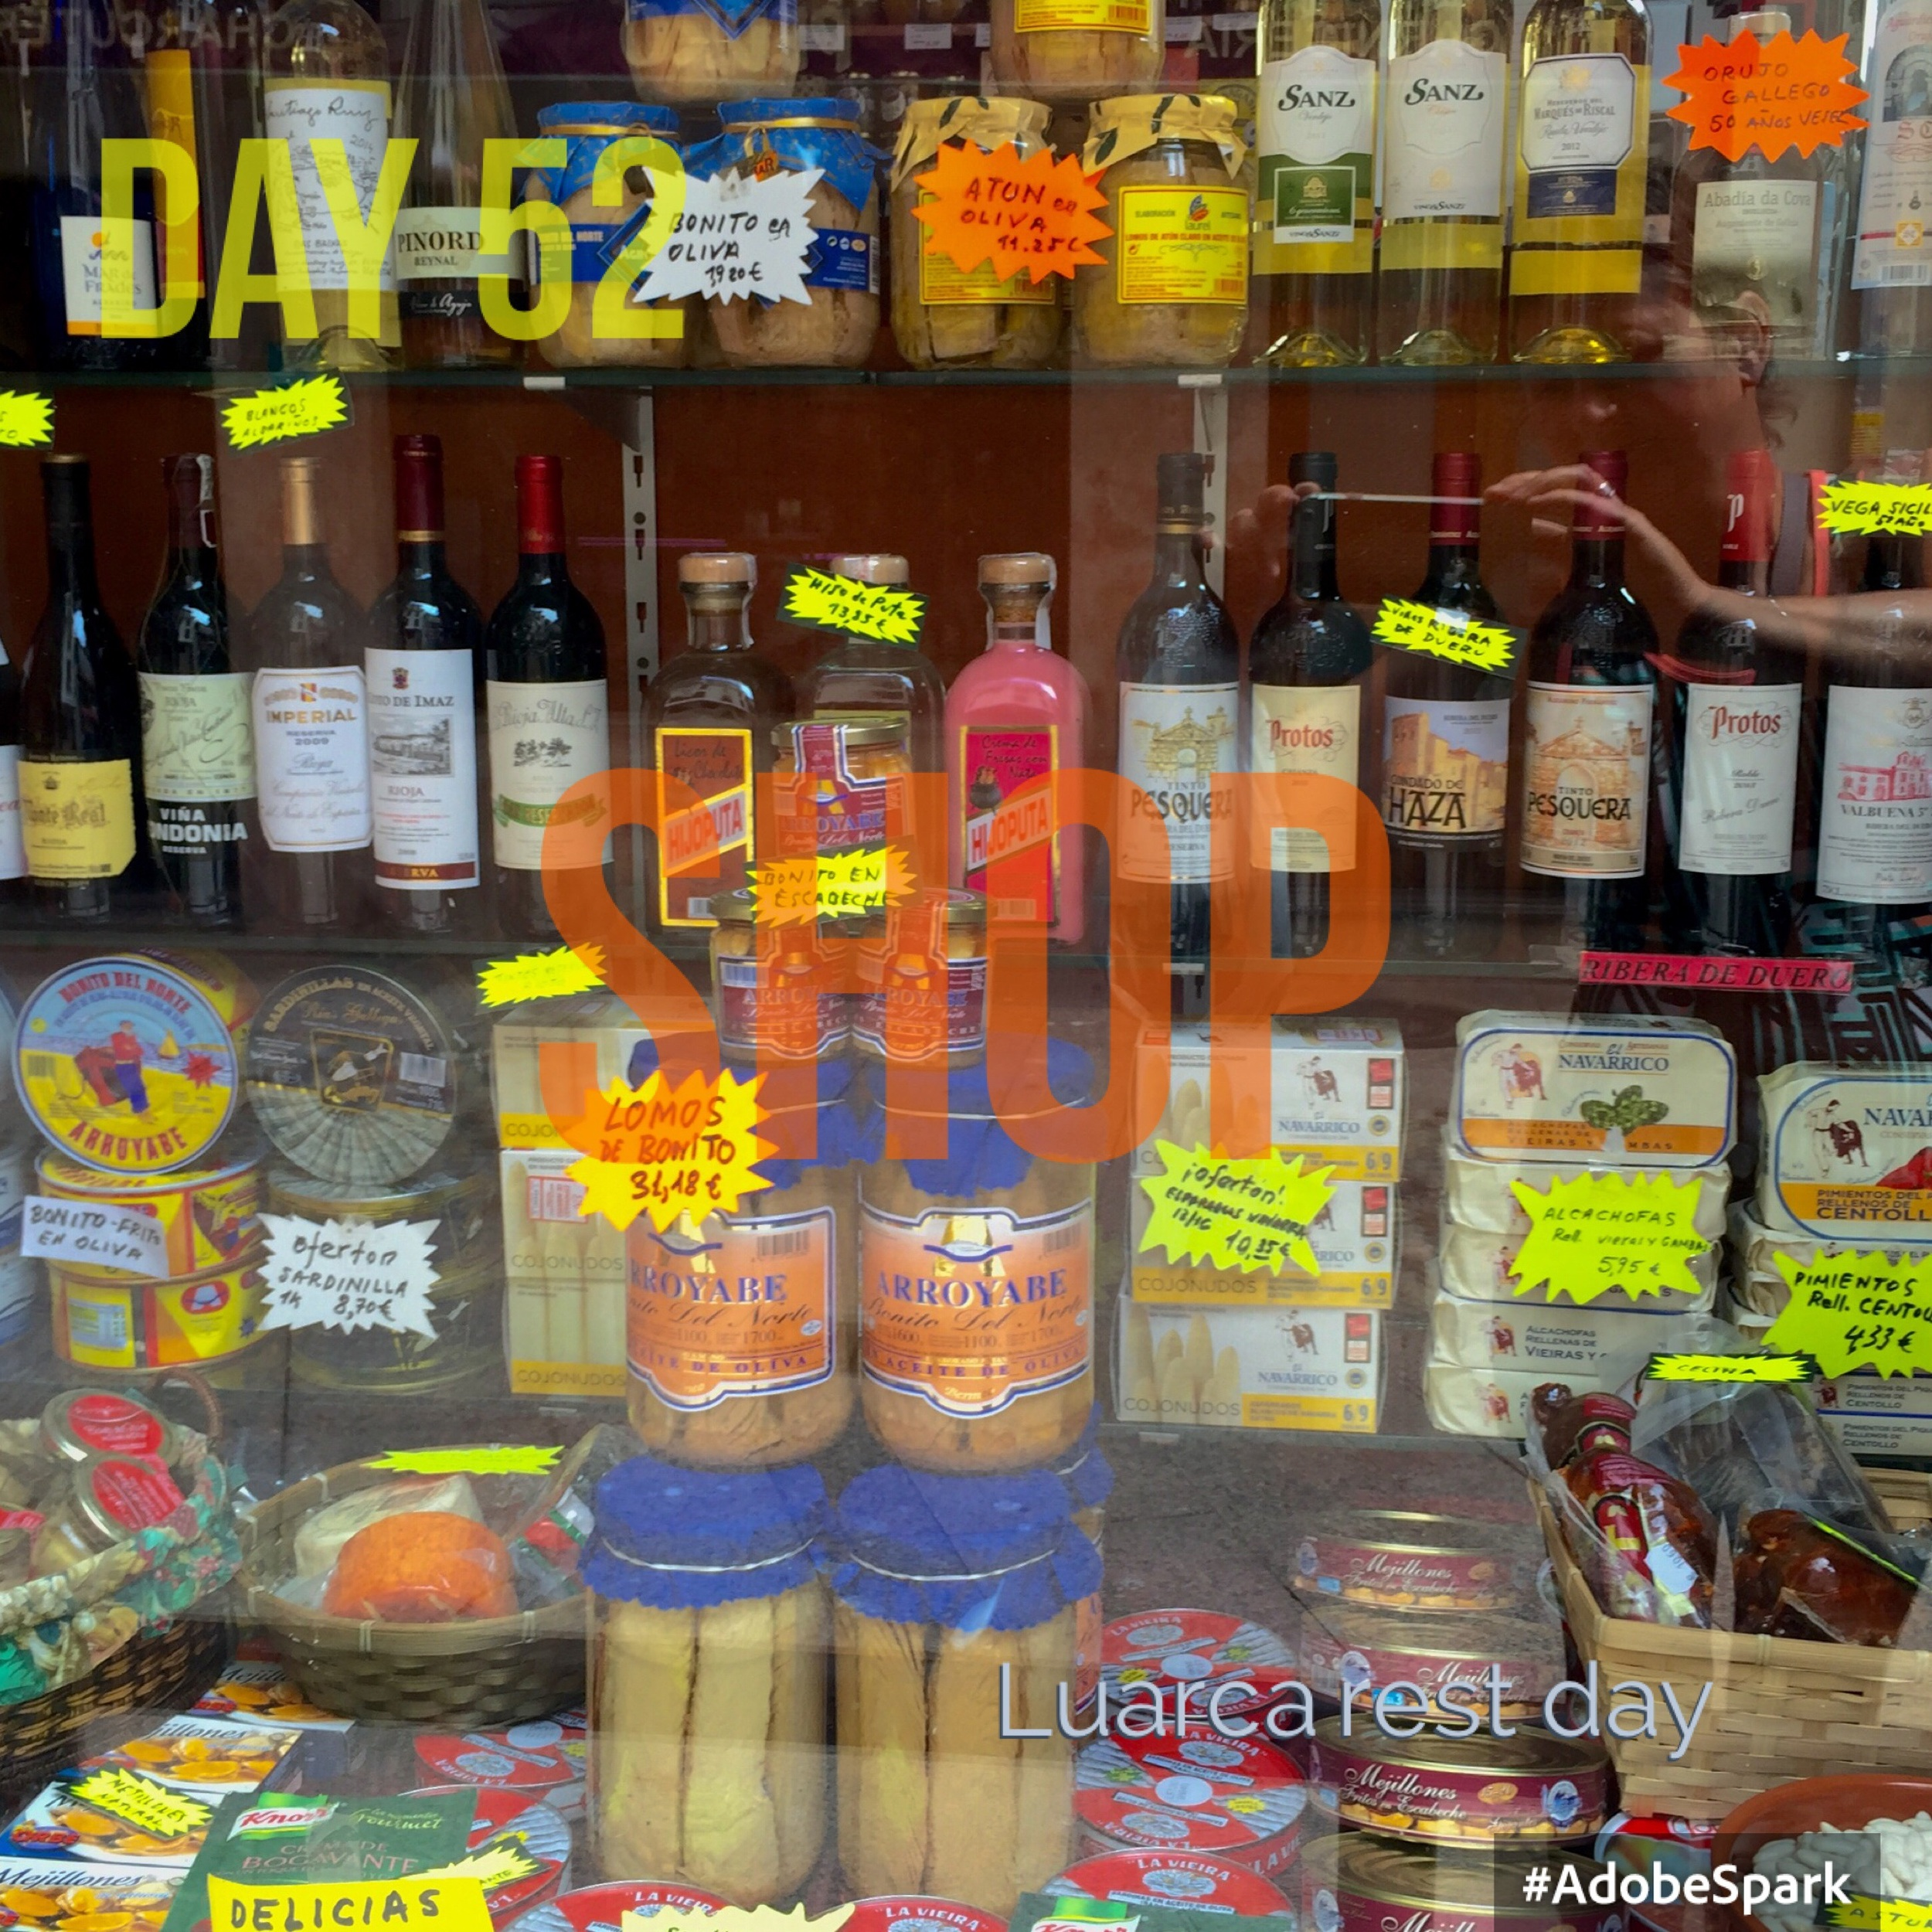 Spain still retains its myriad of little shops